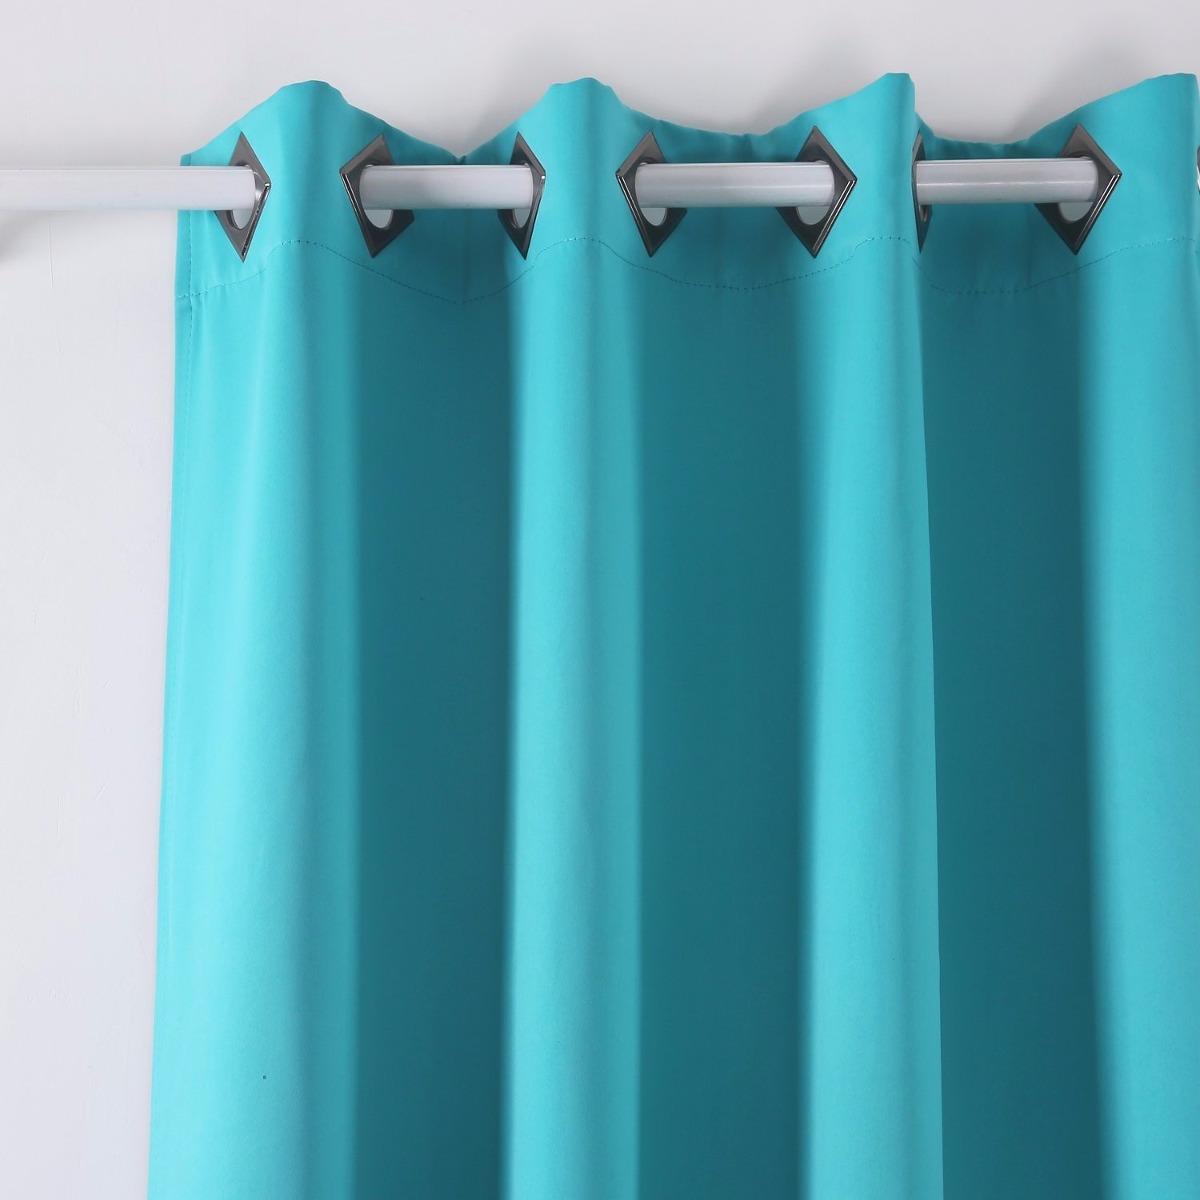 Cortinas decorativas termicas 132x241cm color turquesa - Cortinas turquesa ...